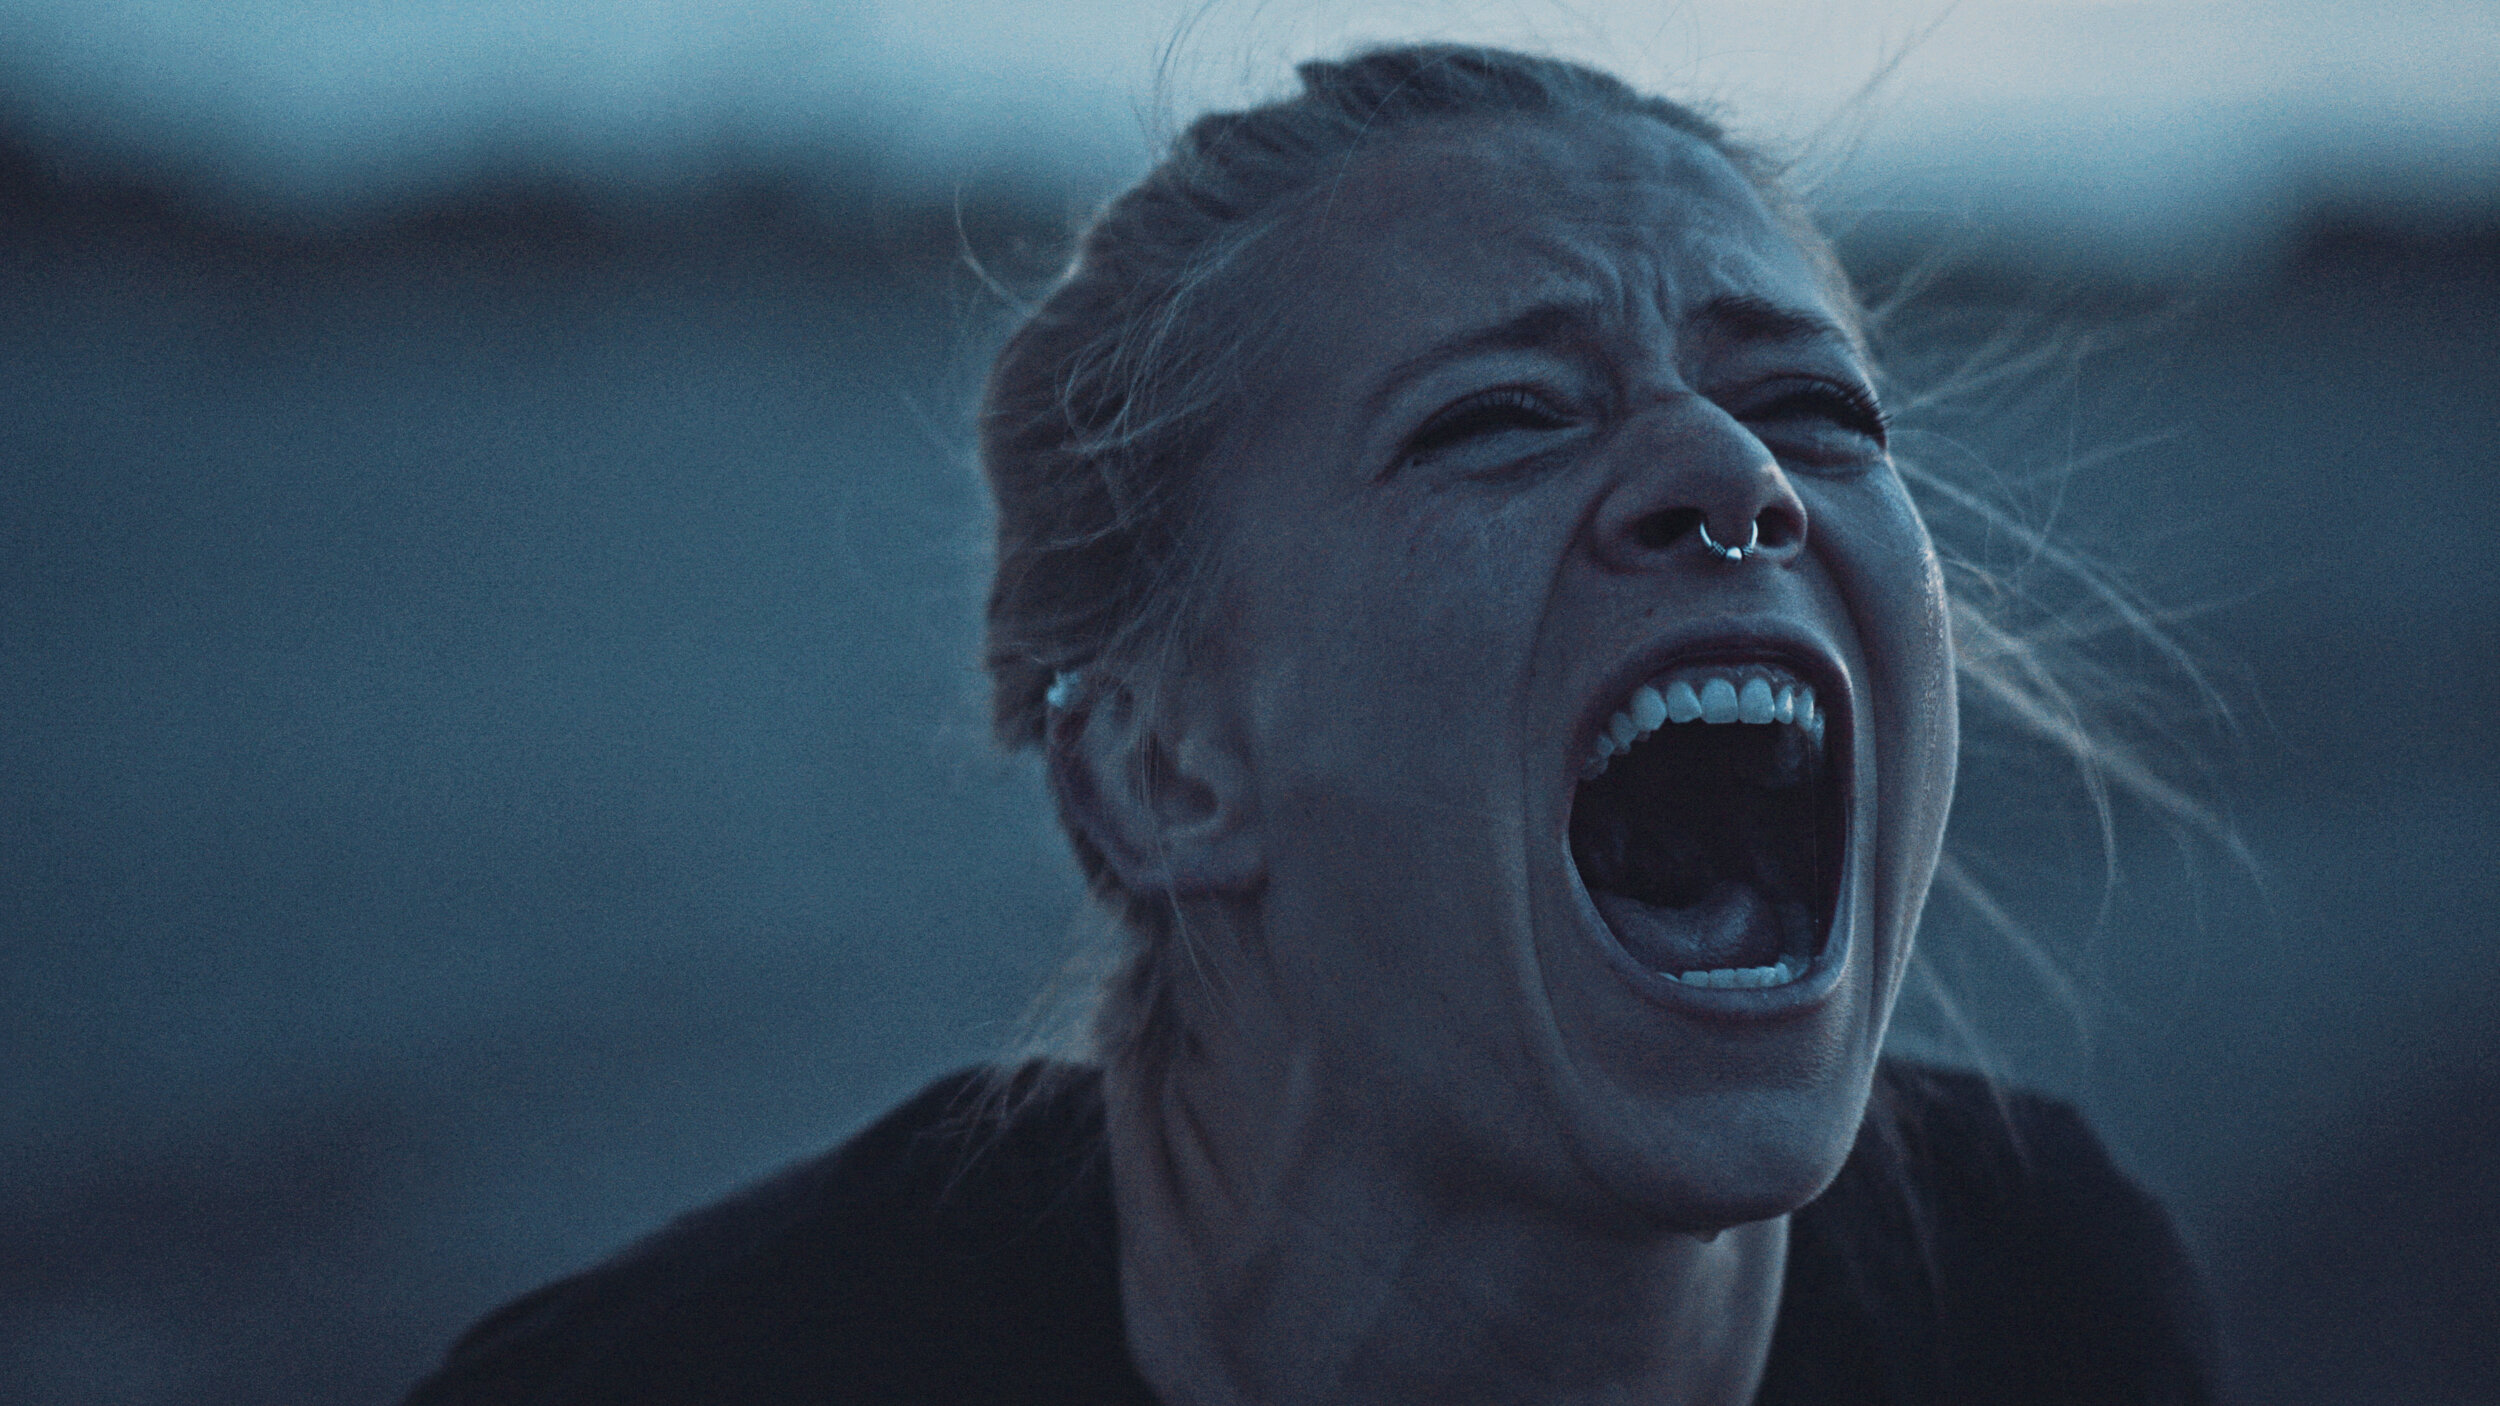 MIE GREN - WINNER - BEST FEMALE ACTOR, MOONFIRE